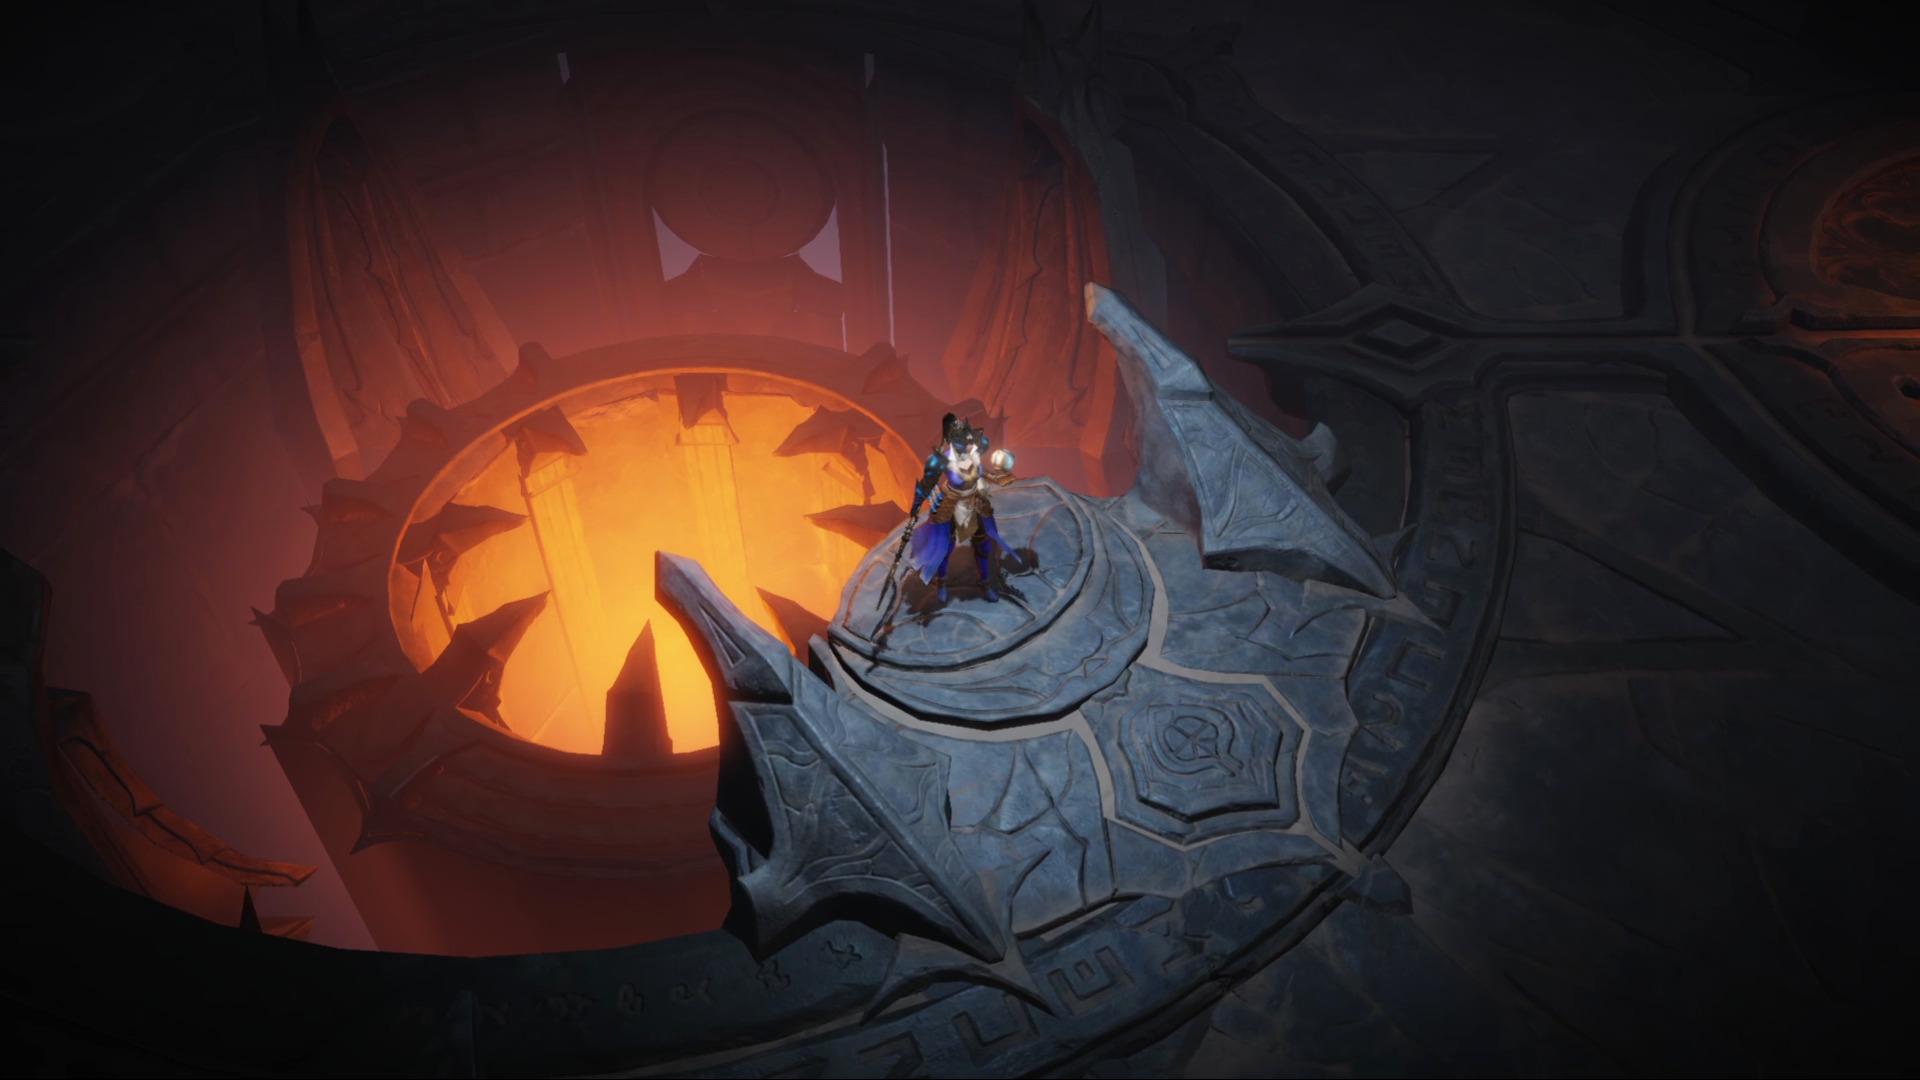 Diablo Immortal Update – Project Status, Development Progress, Possible Release Date, and More